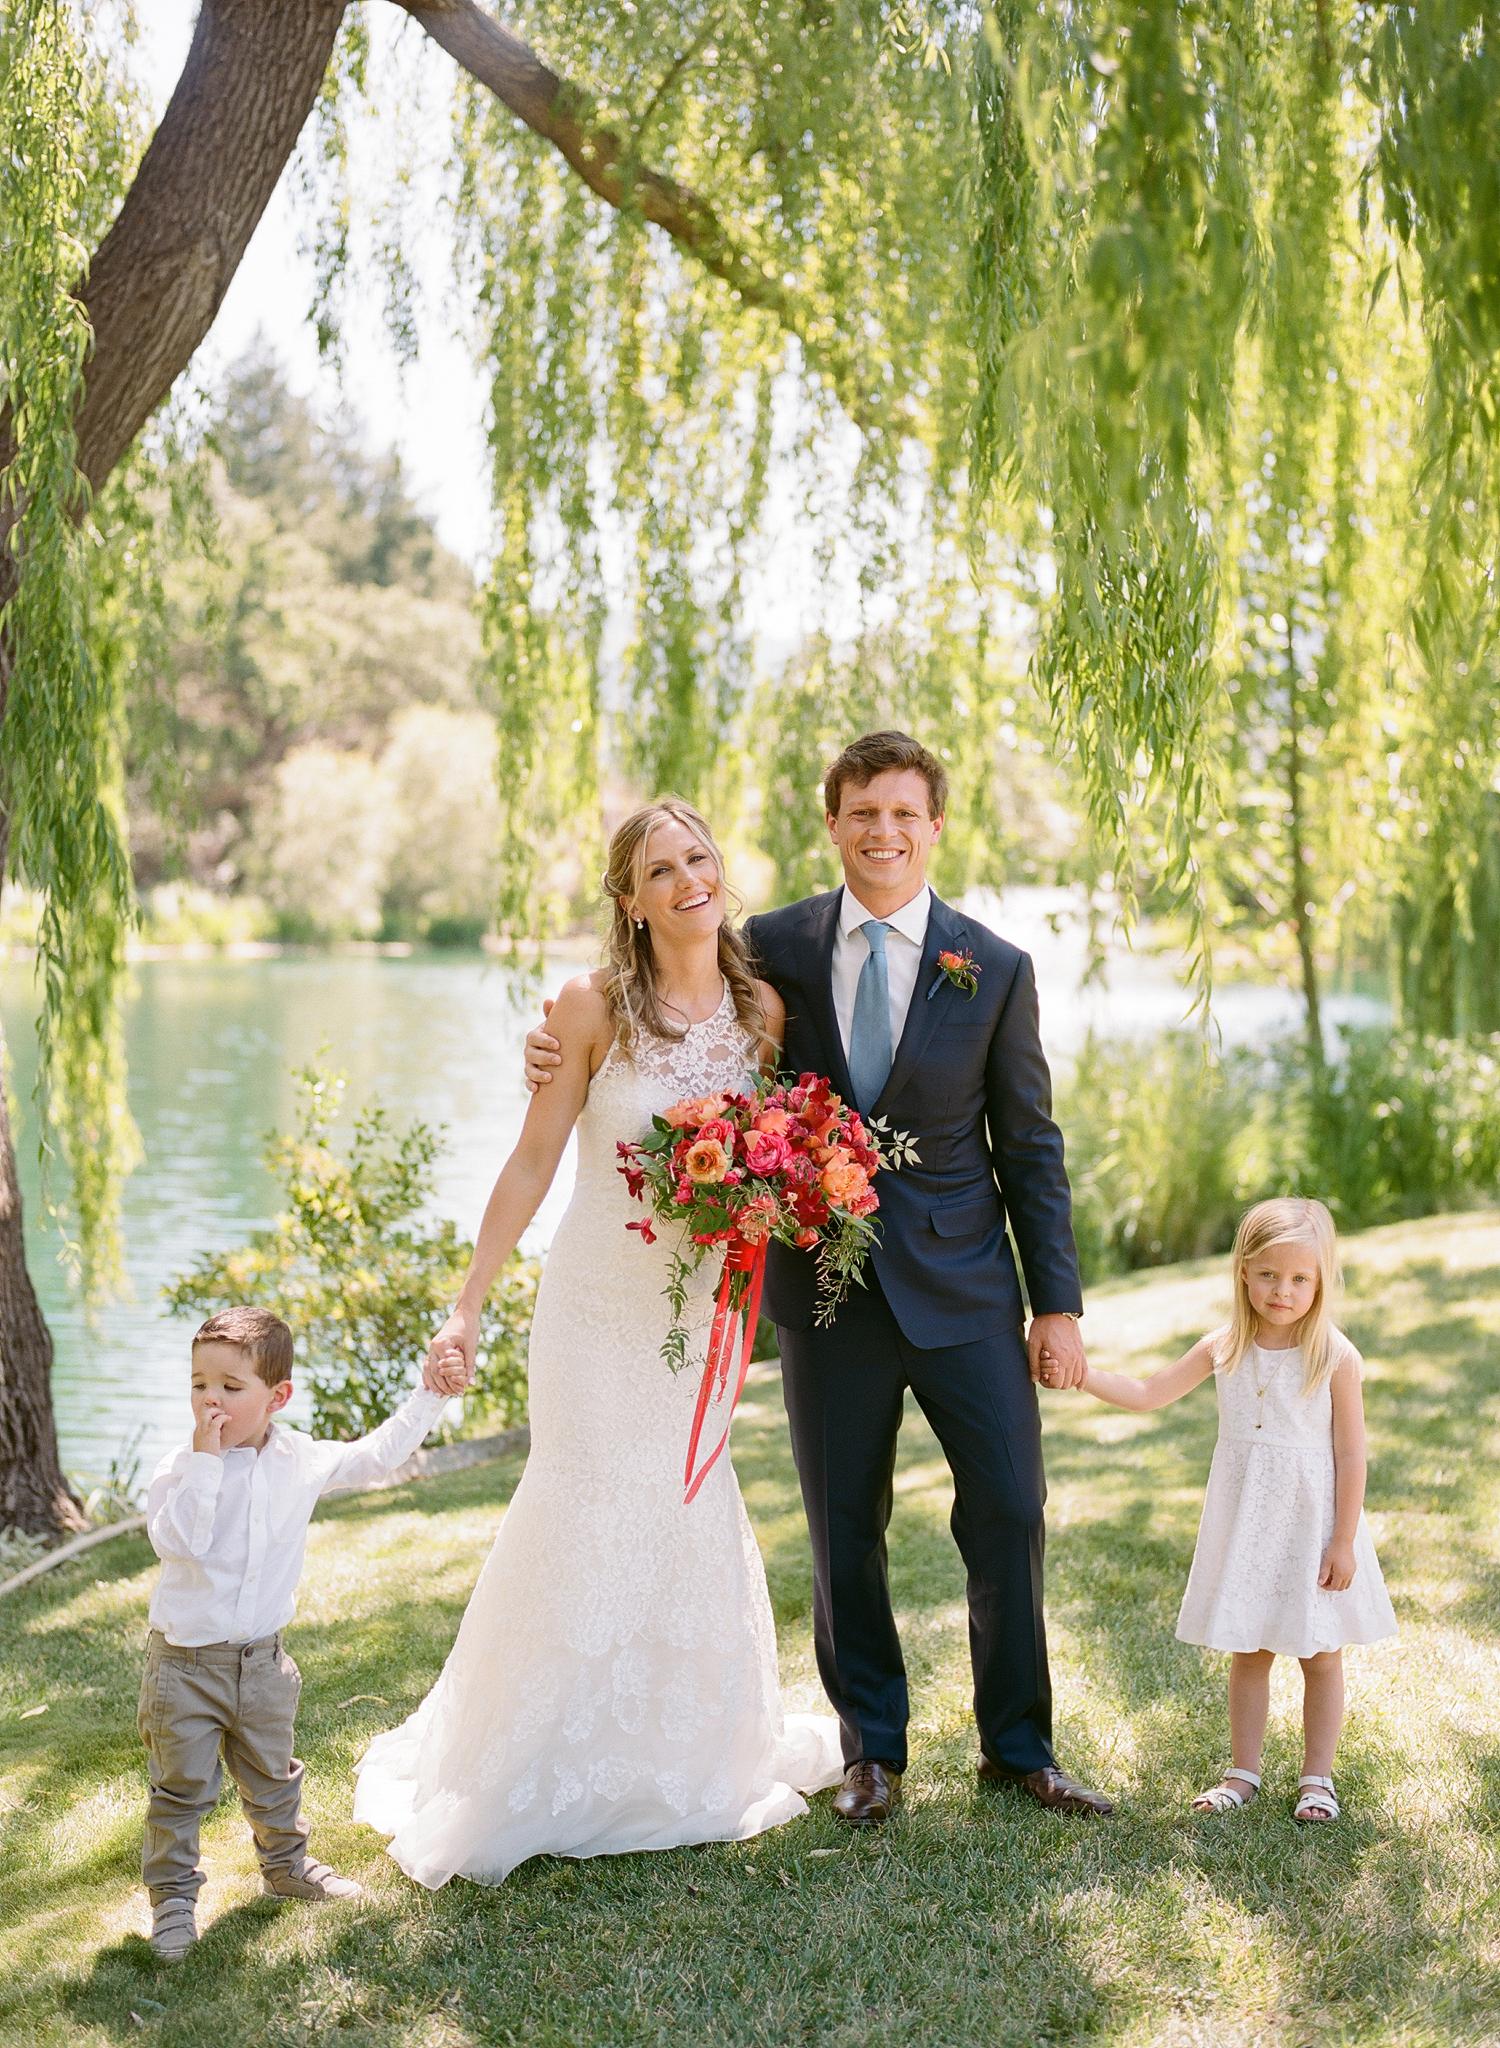 15-bride-groom-little-attendants.jpg